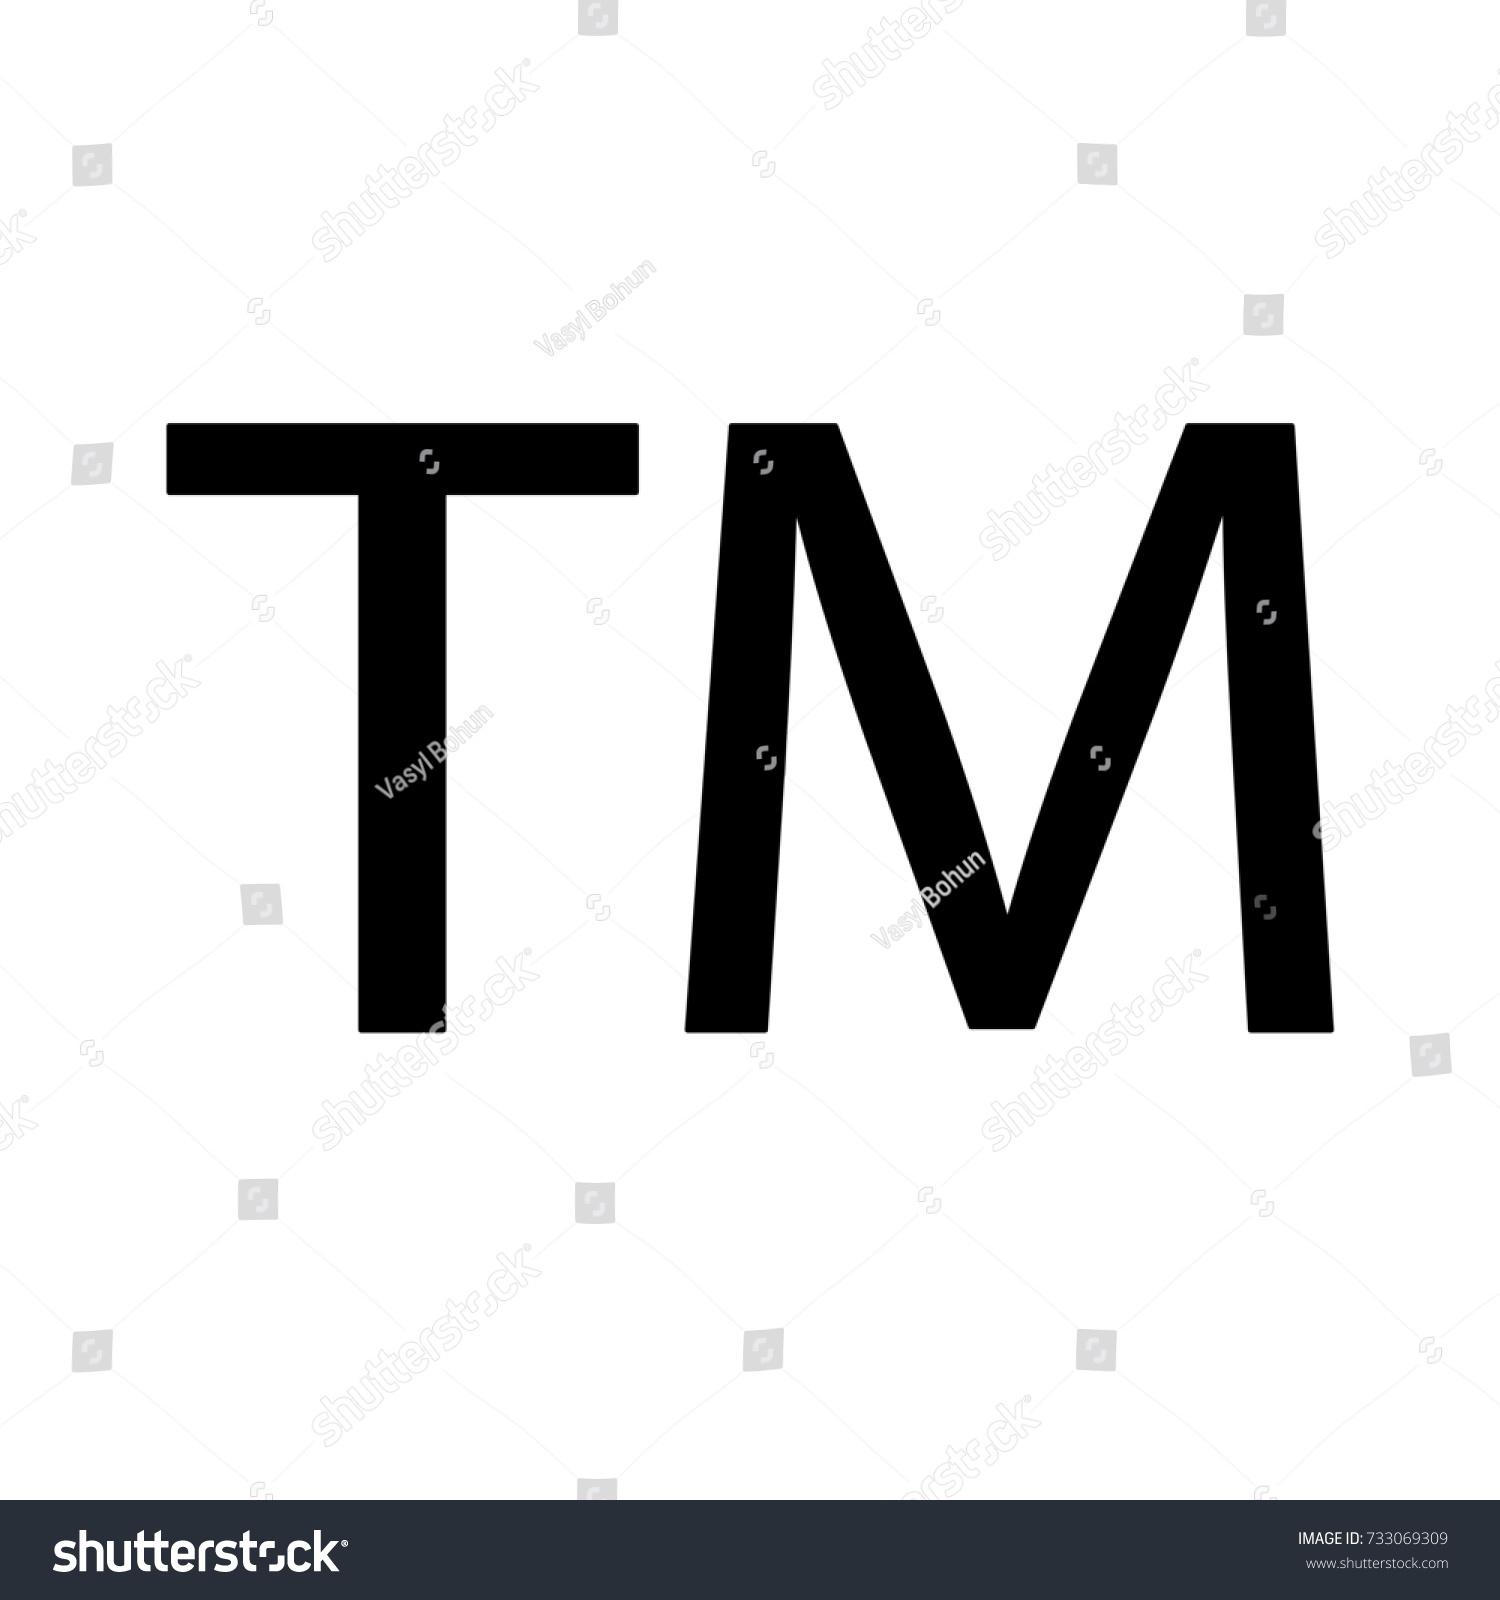 Trademark icon tm symbol stock illustration 733069309 shutterstock trademark icon tm symbol buycottarizona